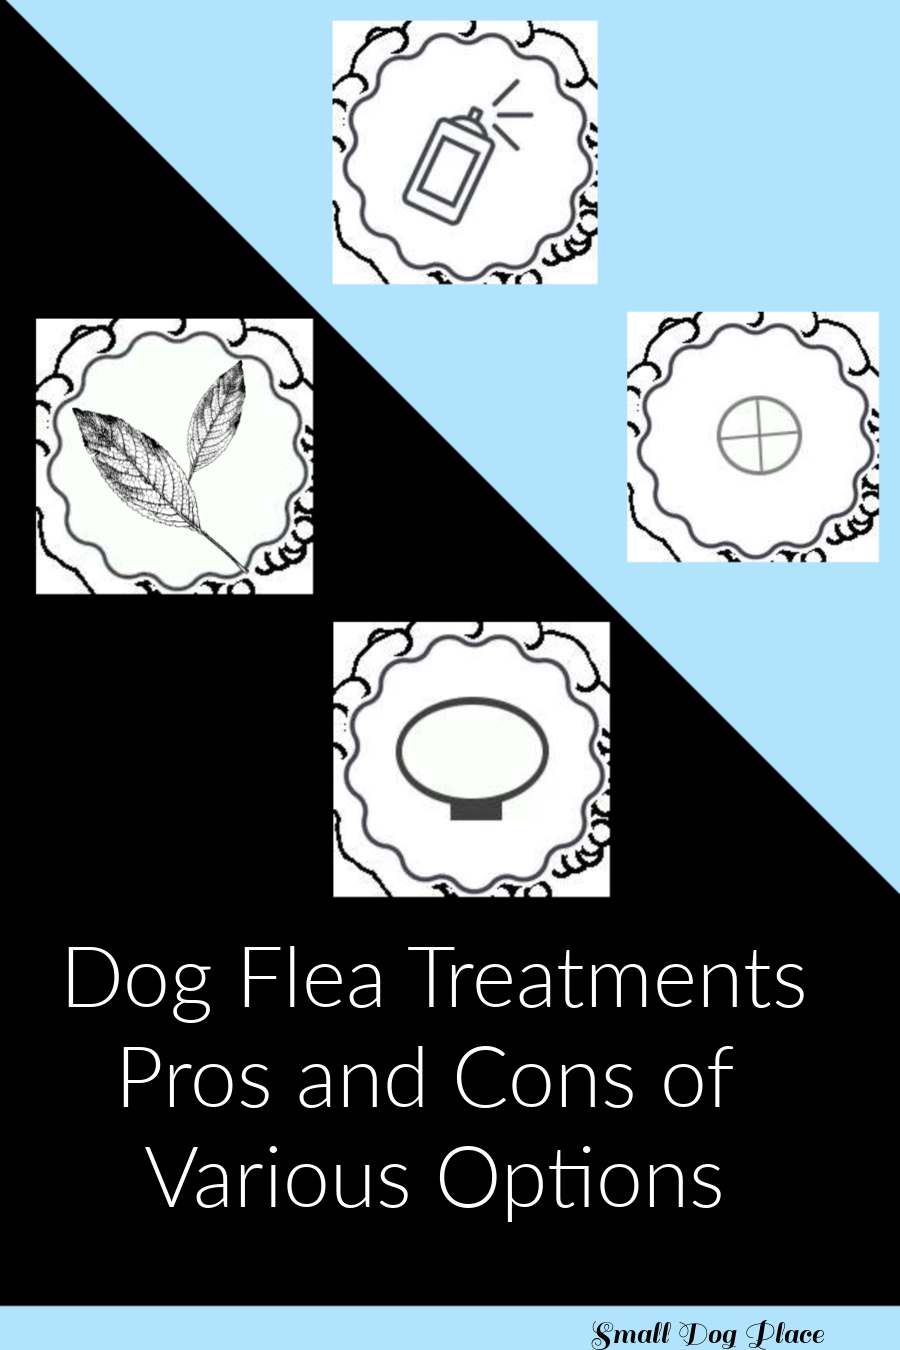 Dog Flea Treatments Pin